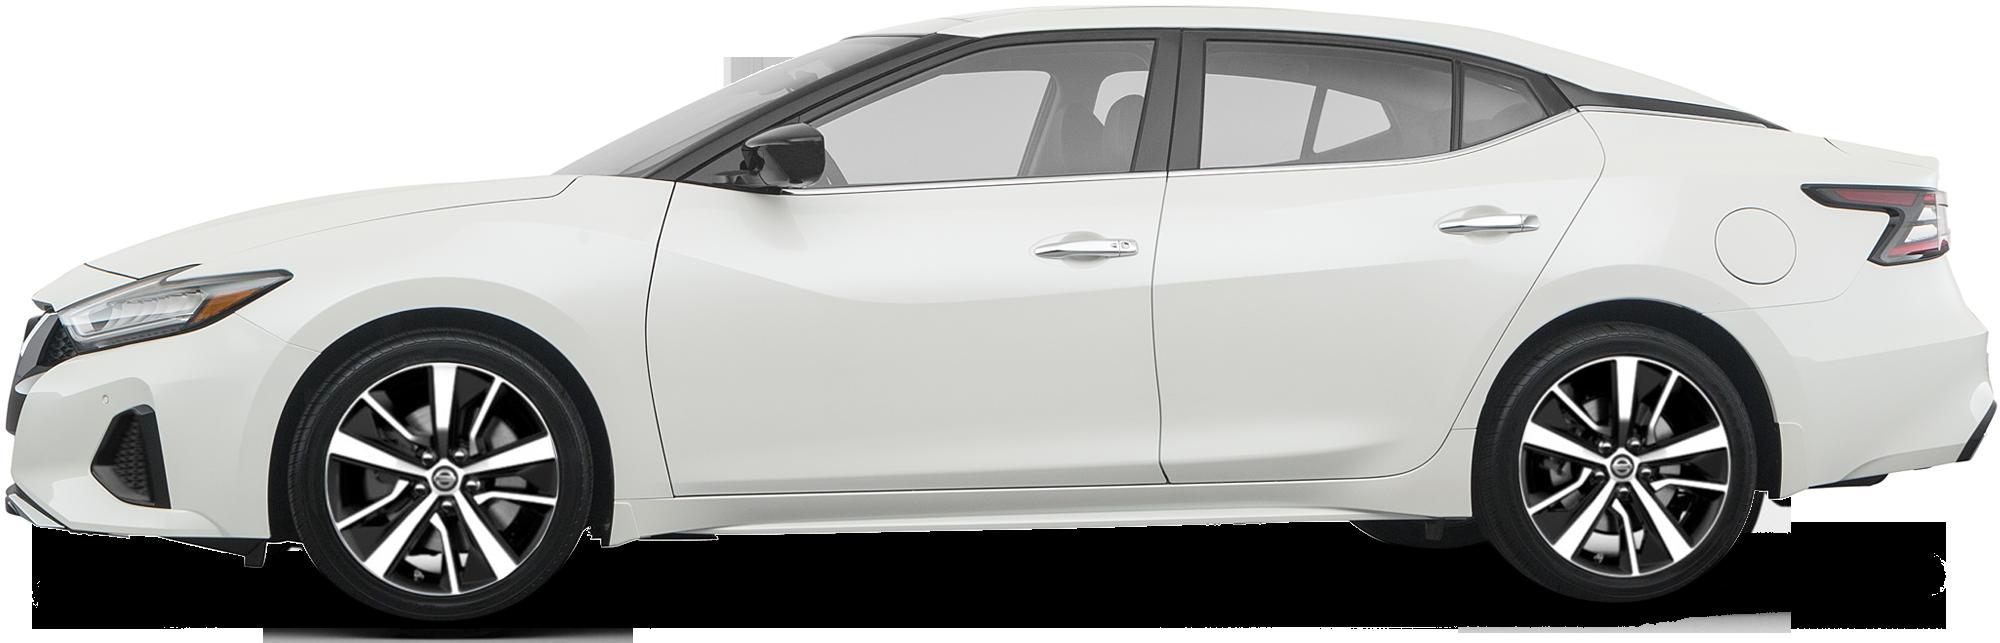 2019 Nissan Maxima Sedan 3.5 S